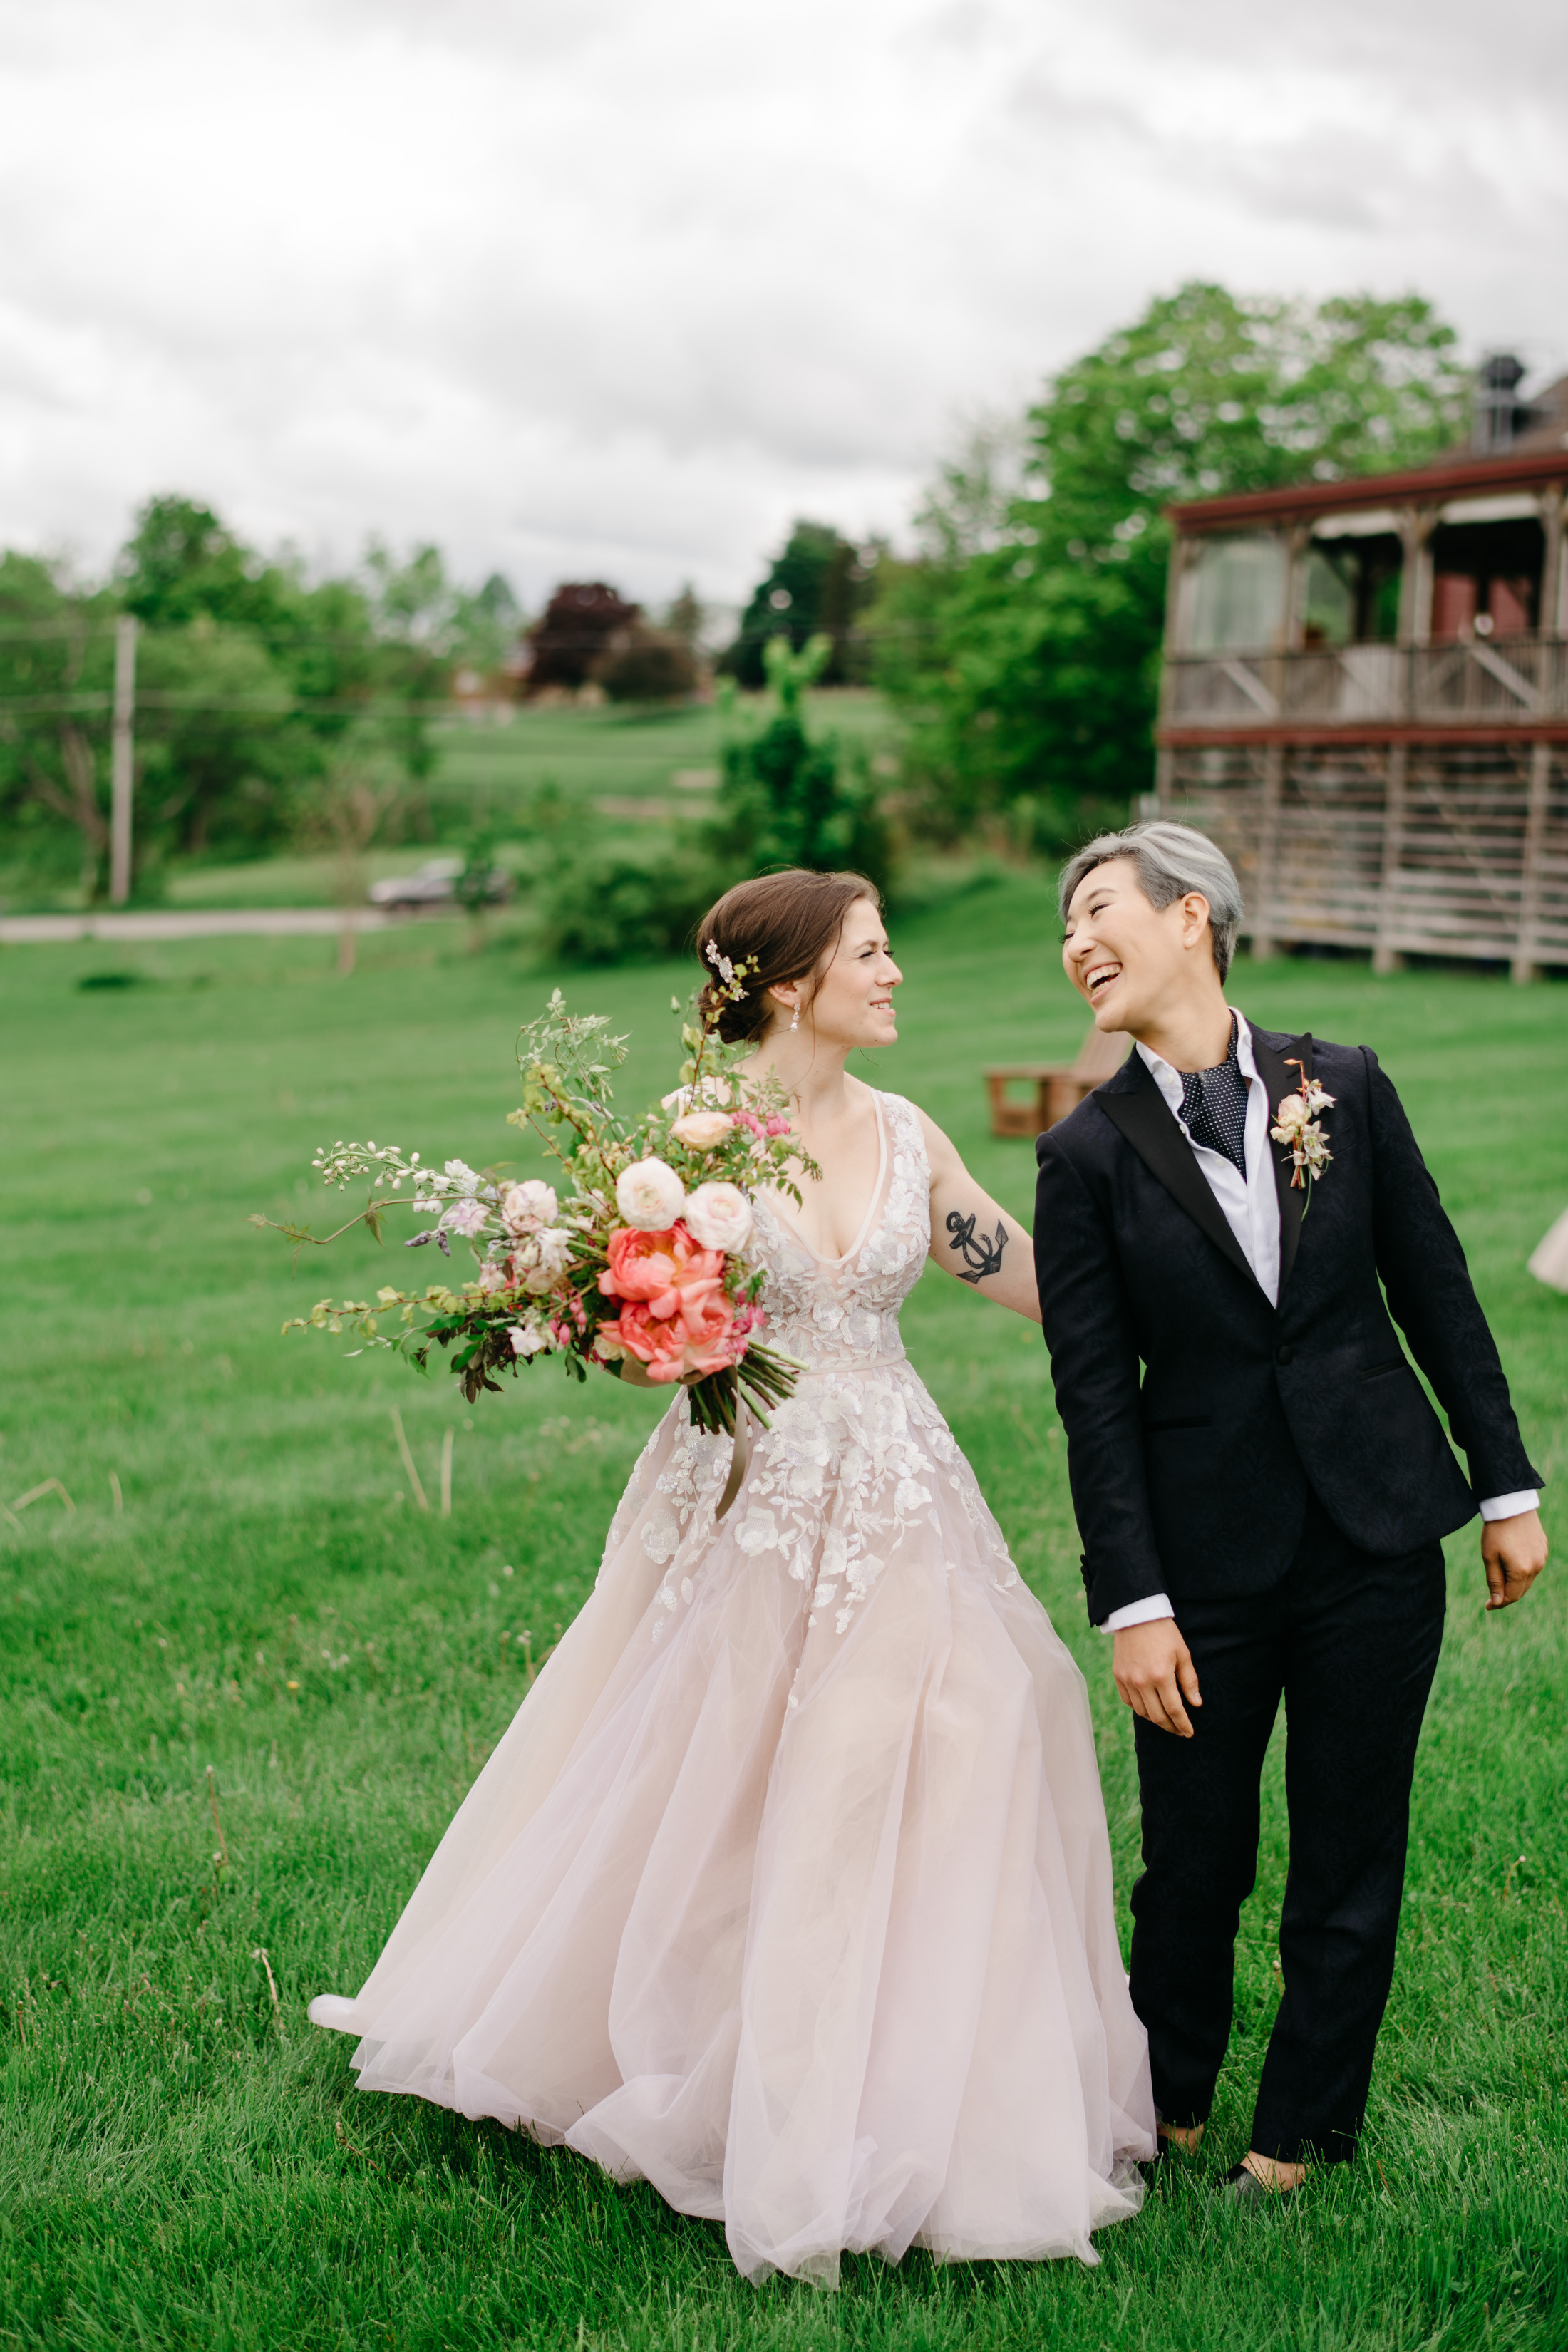 gibbet_hill_barn_same_sex_wedding_photos_26.JPG